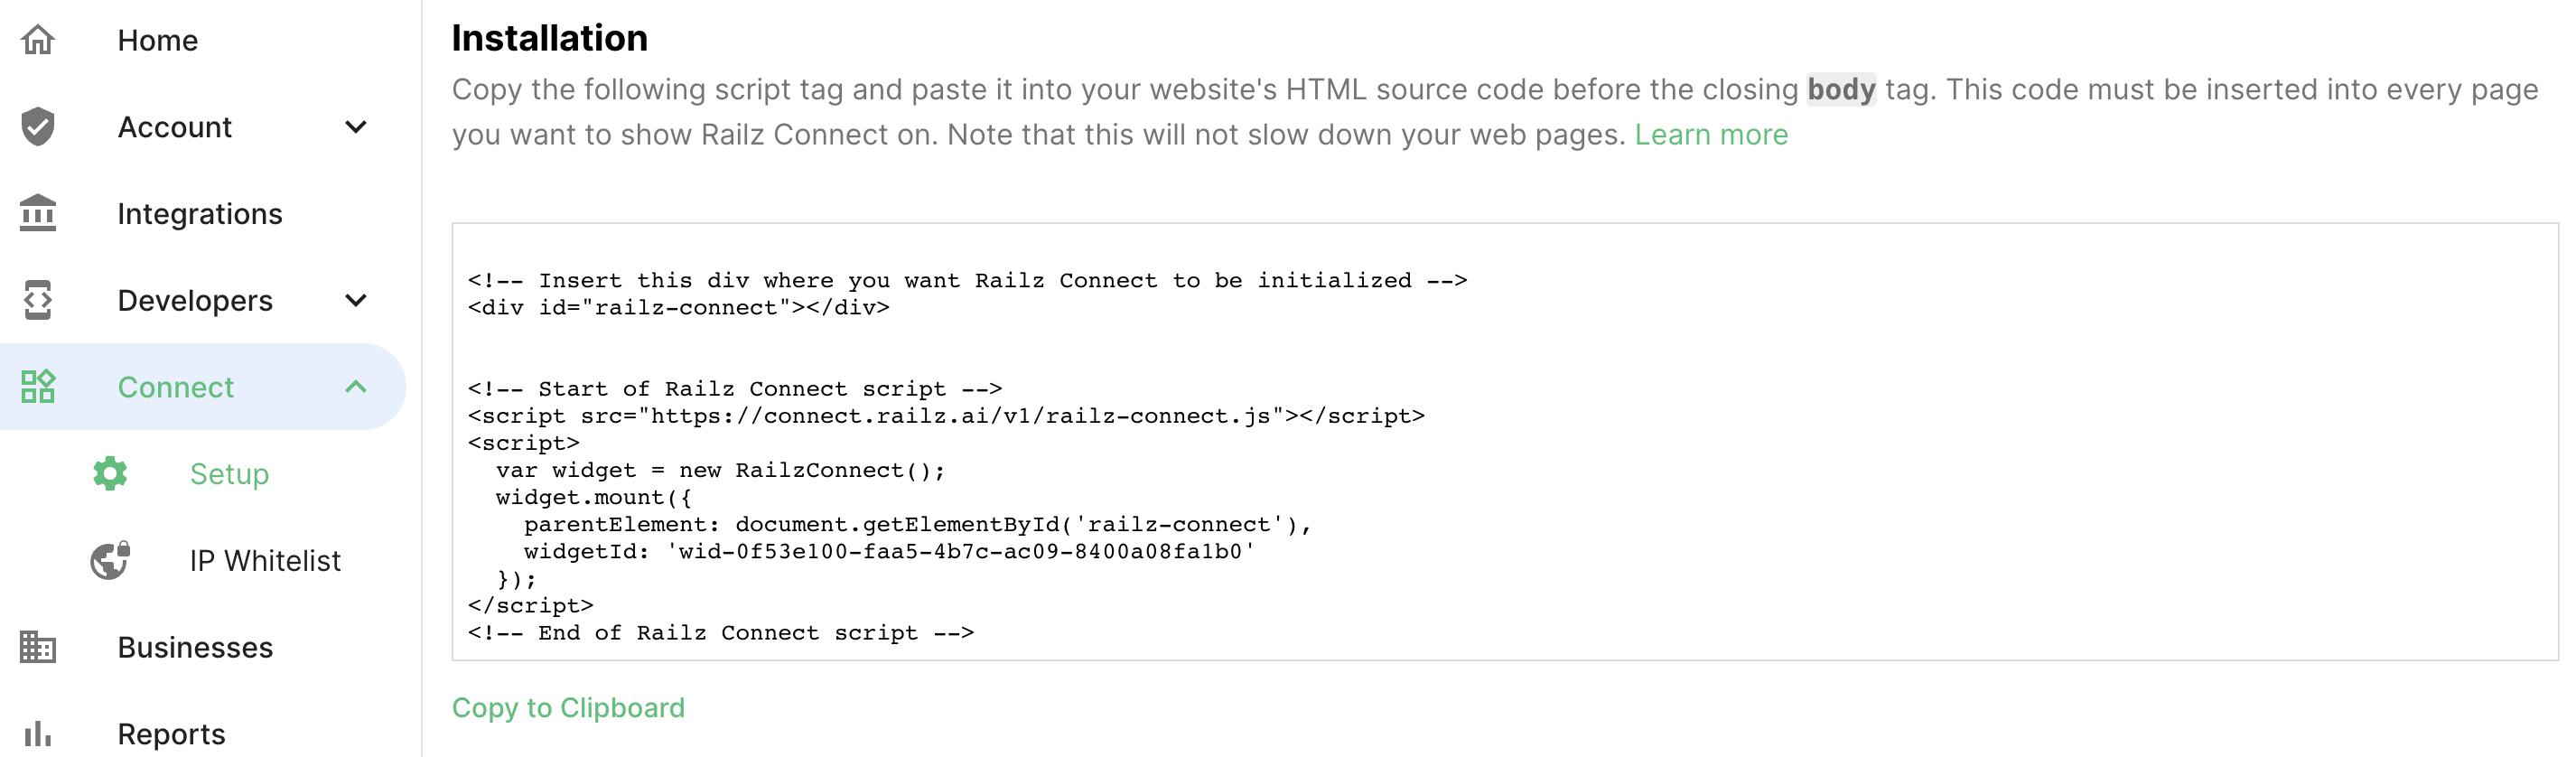 Railz Connect Setup Page. Click to Expand.